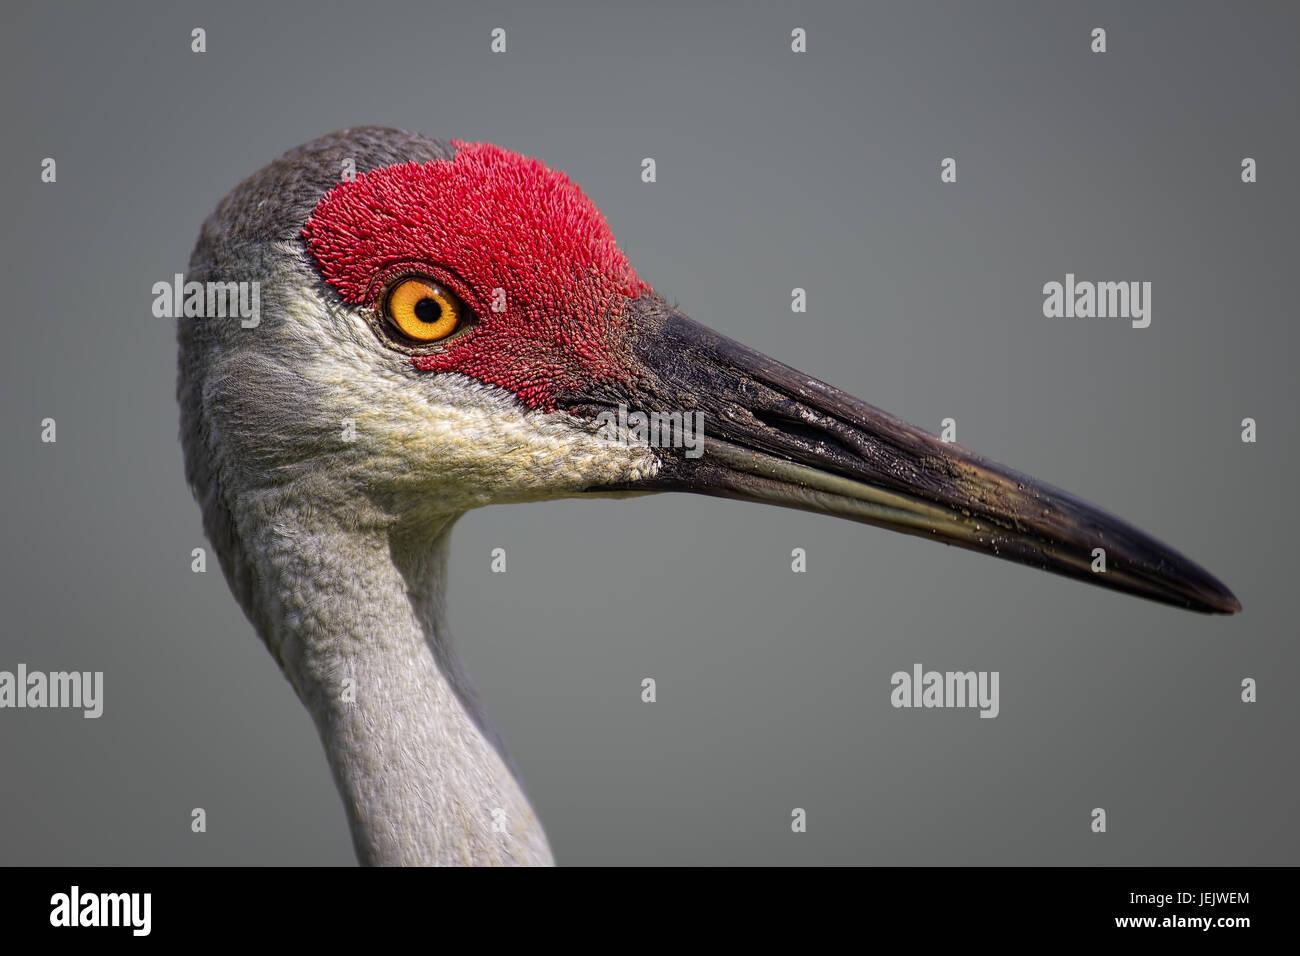 Bird, Sanhill Crane, Day, Florida, USA - Stock Image